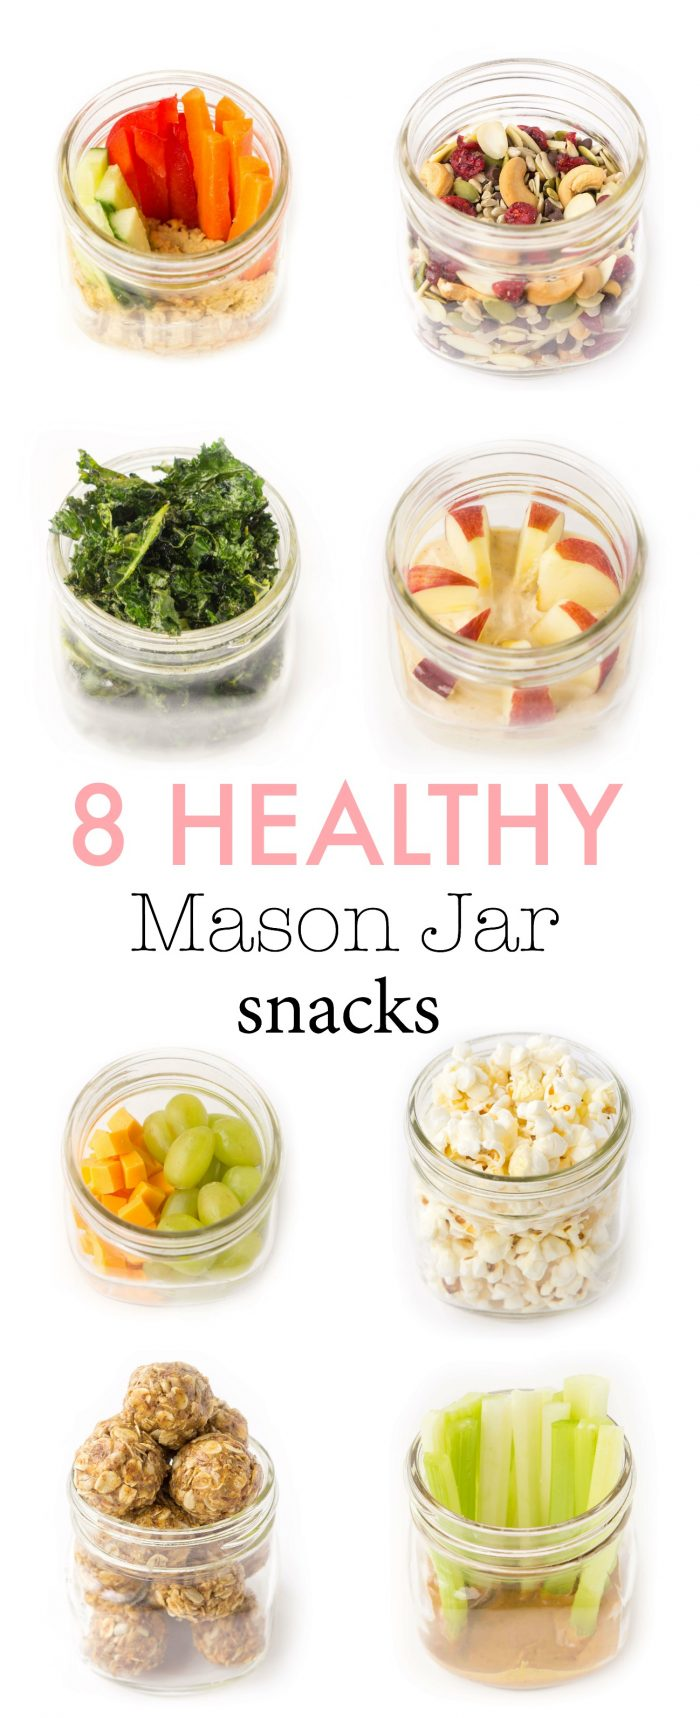 Healthy Make-Ahead Snack Ideas